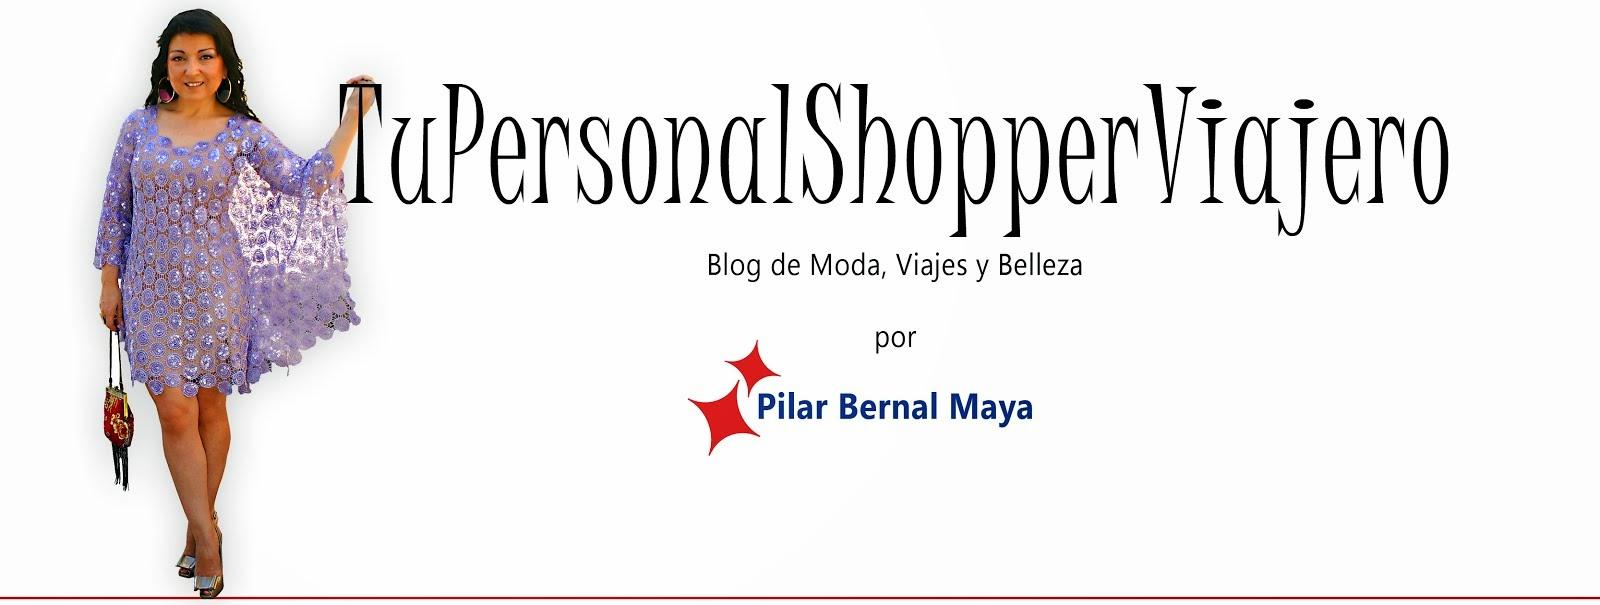 Tupersonalshopperviajero.- Blog de Moda Sevilla